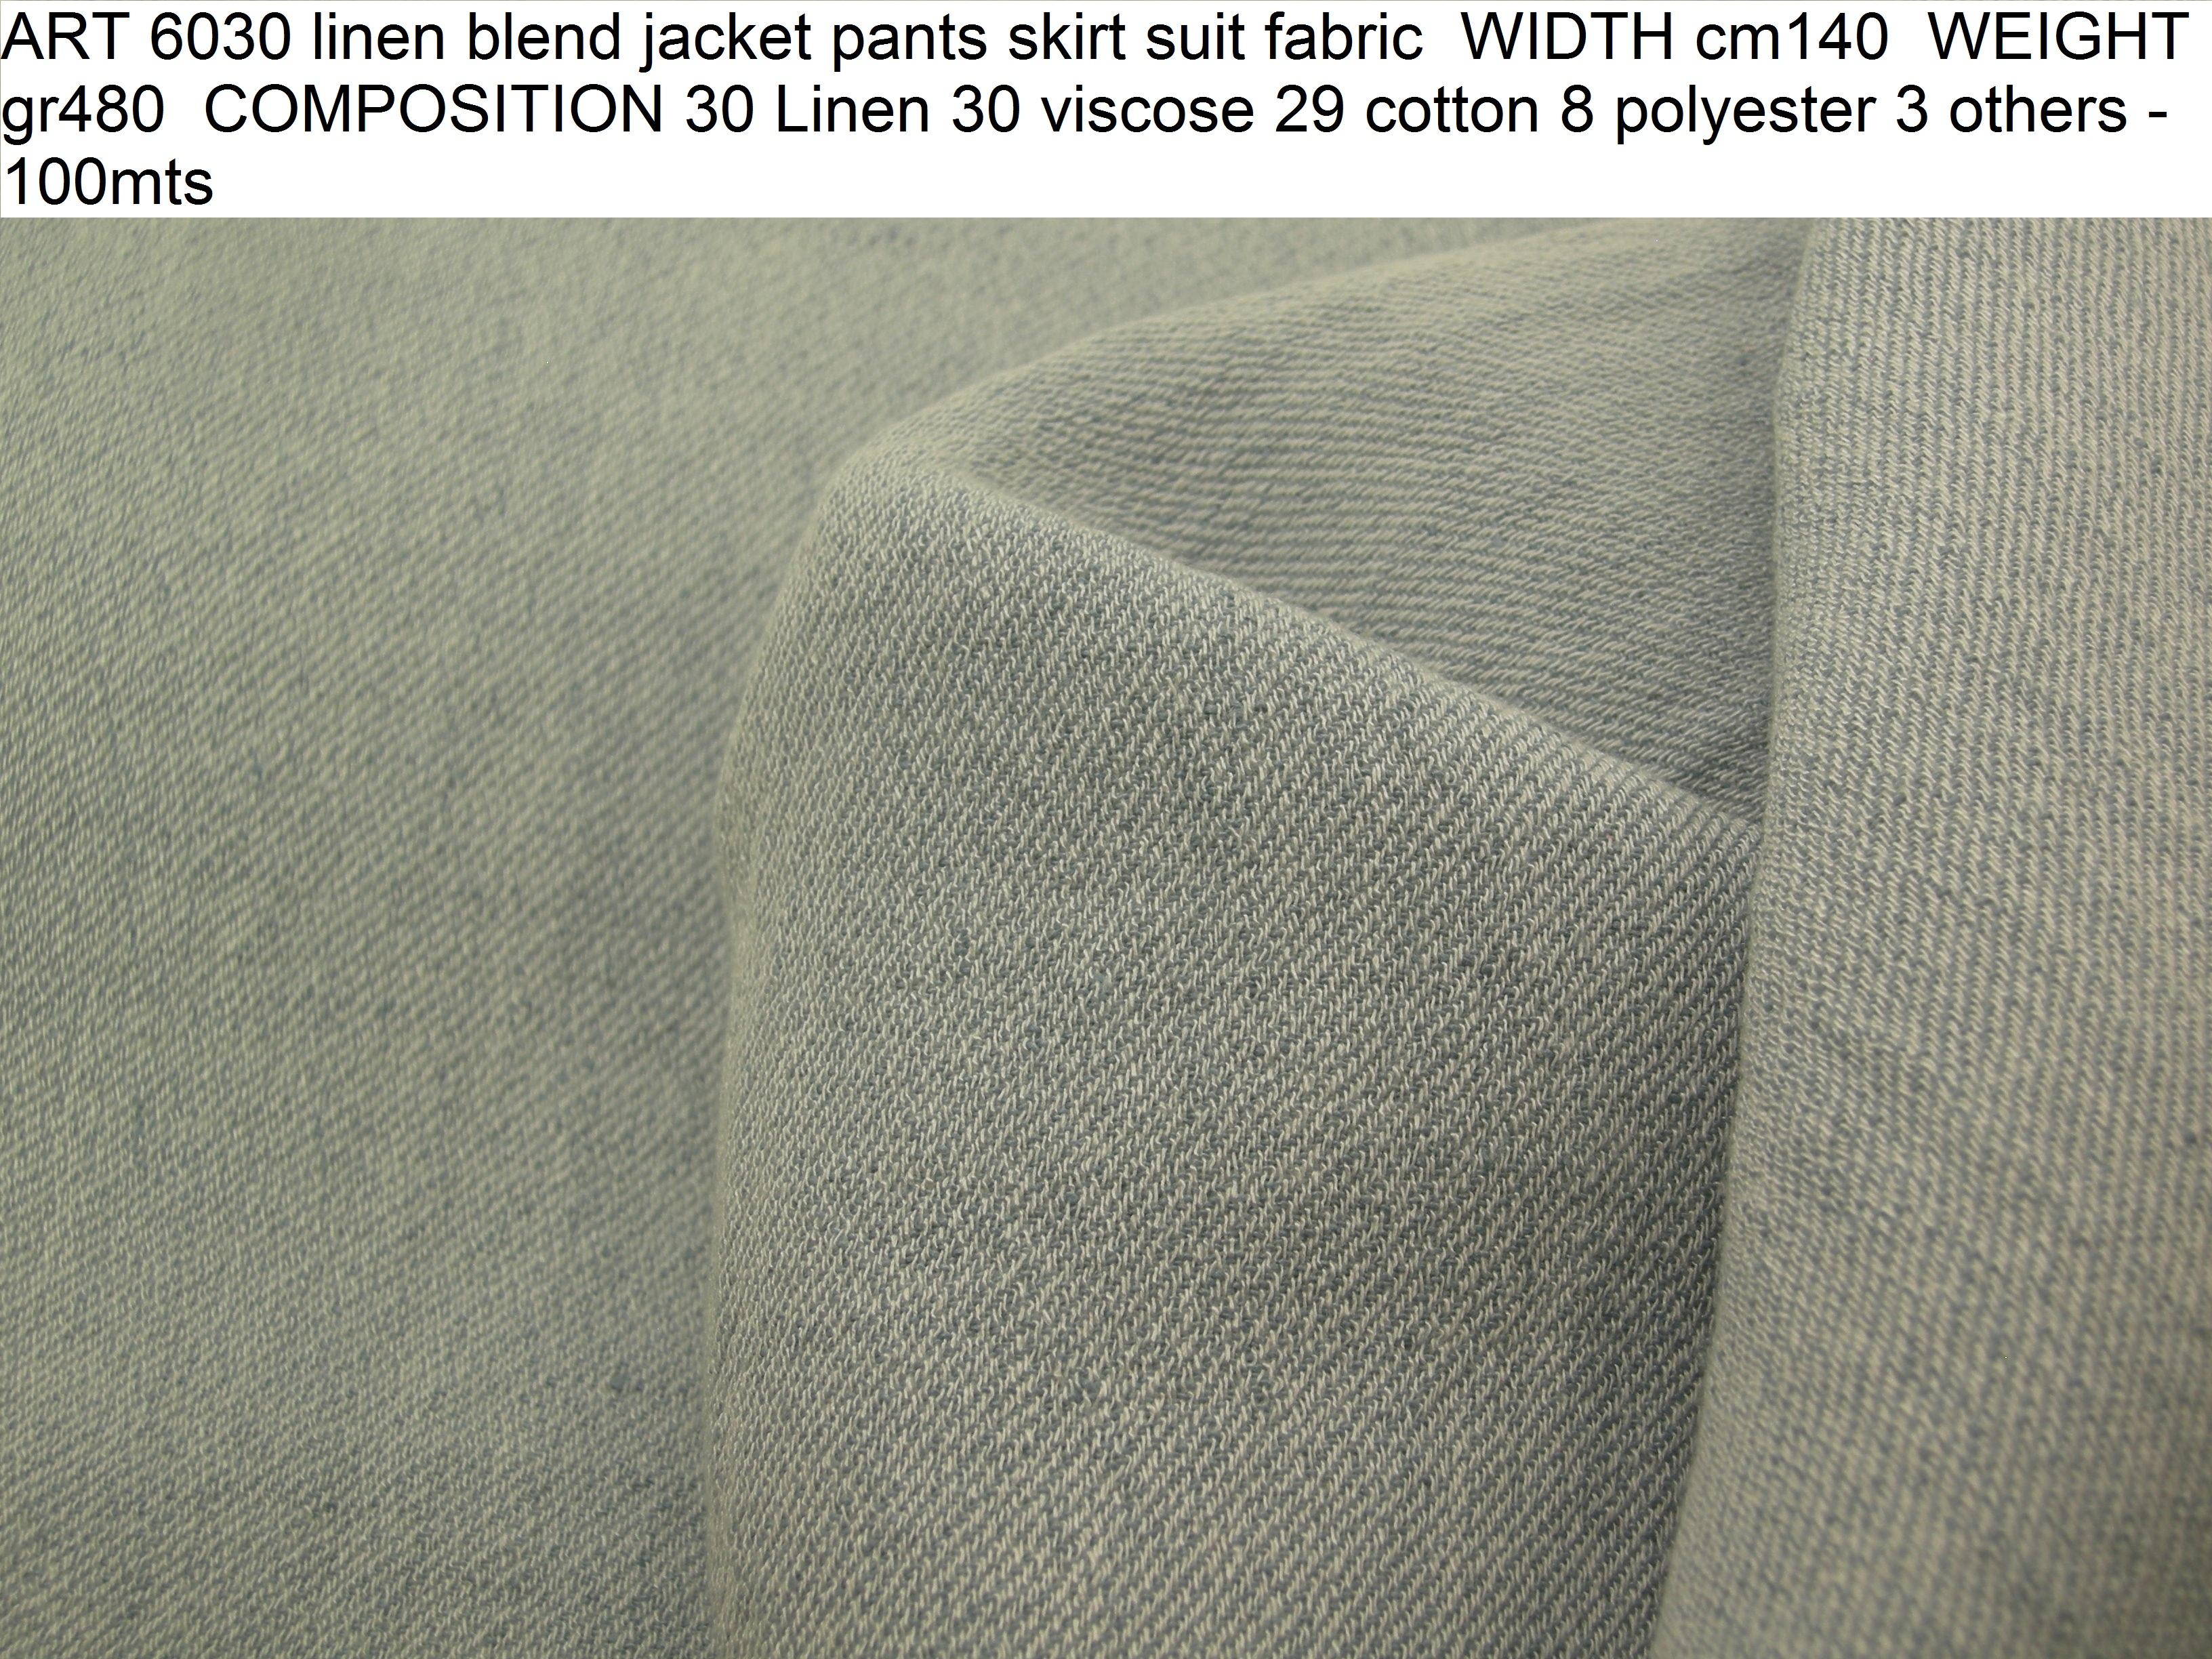 ART 6030 linen blend jacket pants skirt suit fabric WIDTH cm140 WEIGHT gr480 COMPOSITION 30 Linen 30 viscose 29 cotton 8 polyester 3 others - 100mts